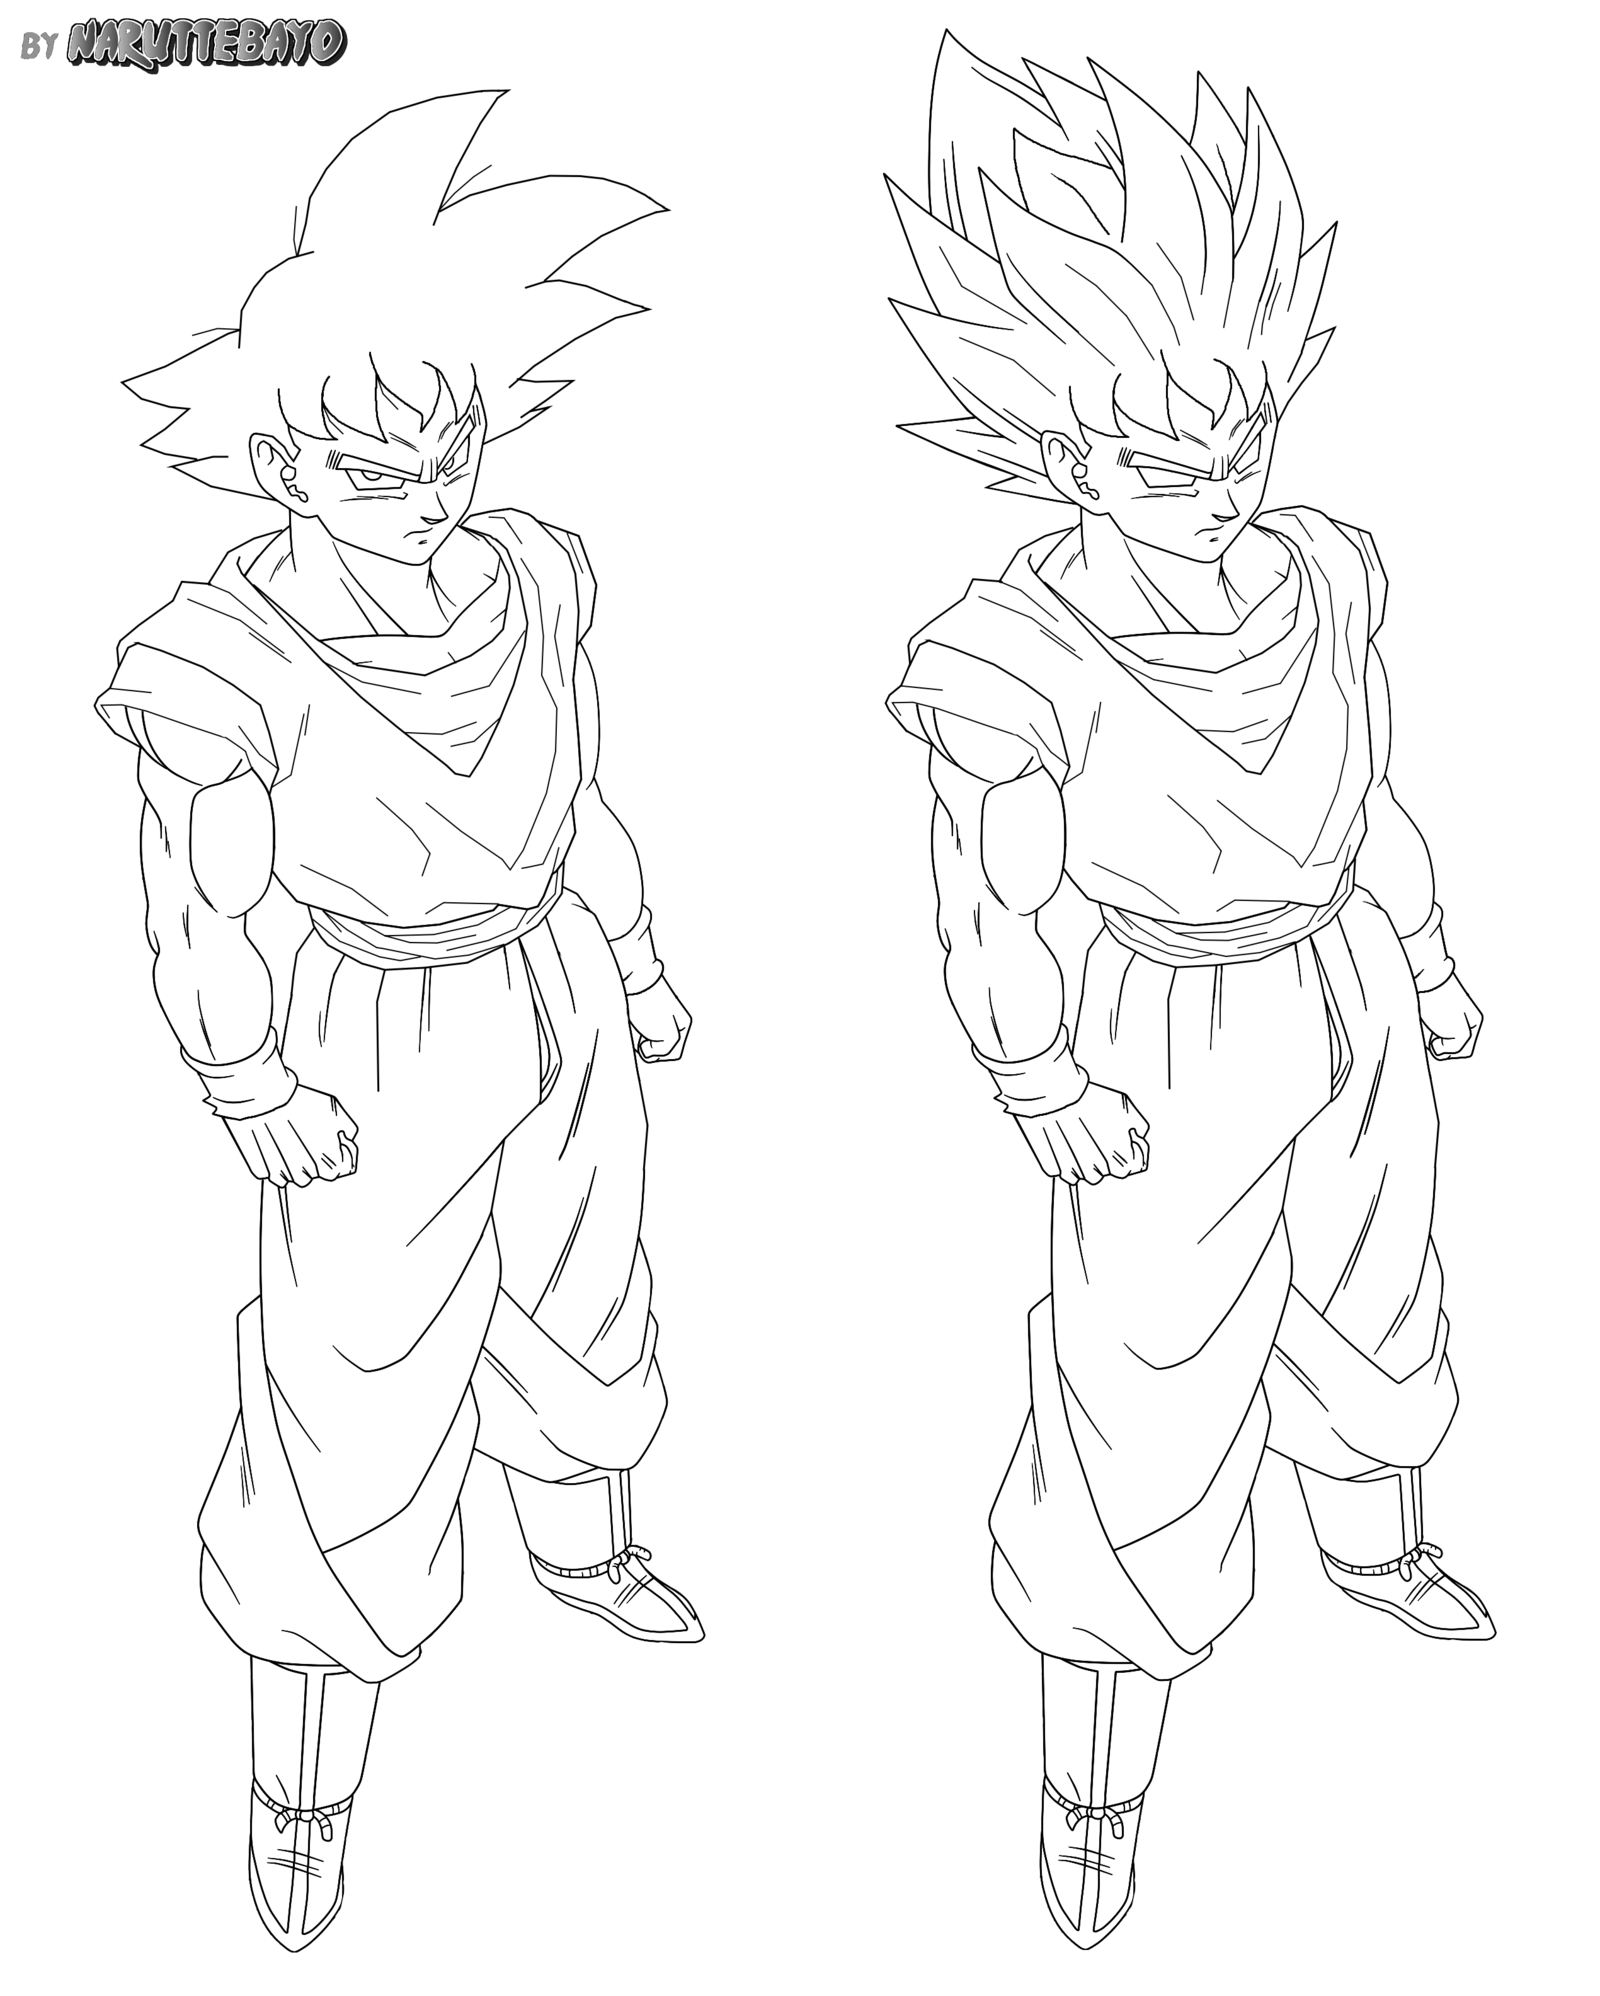 Goku Normal False Full Body By Naruttebayo67 Coo Stoooof